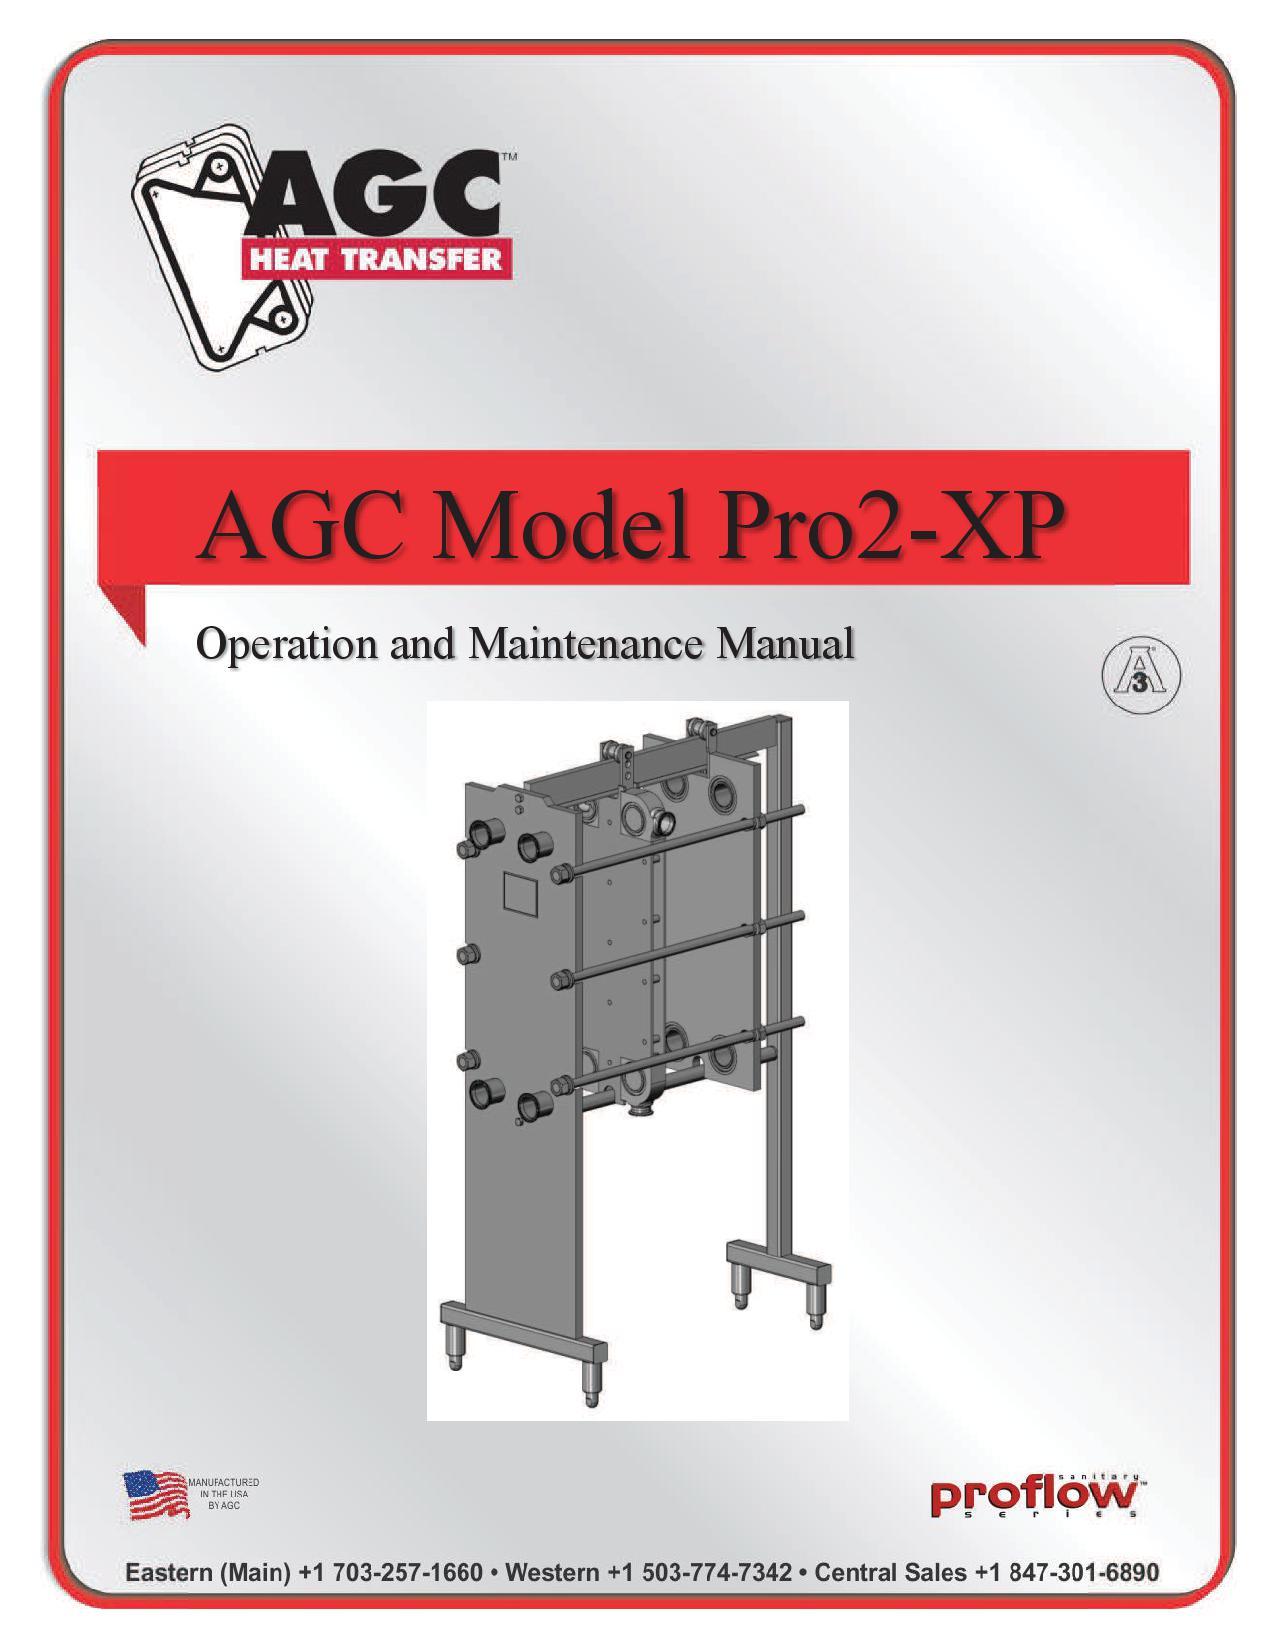 PRO2-XP OPERATION MANUAL